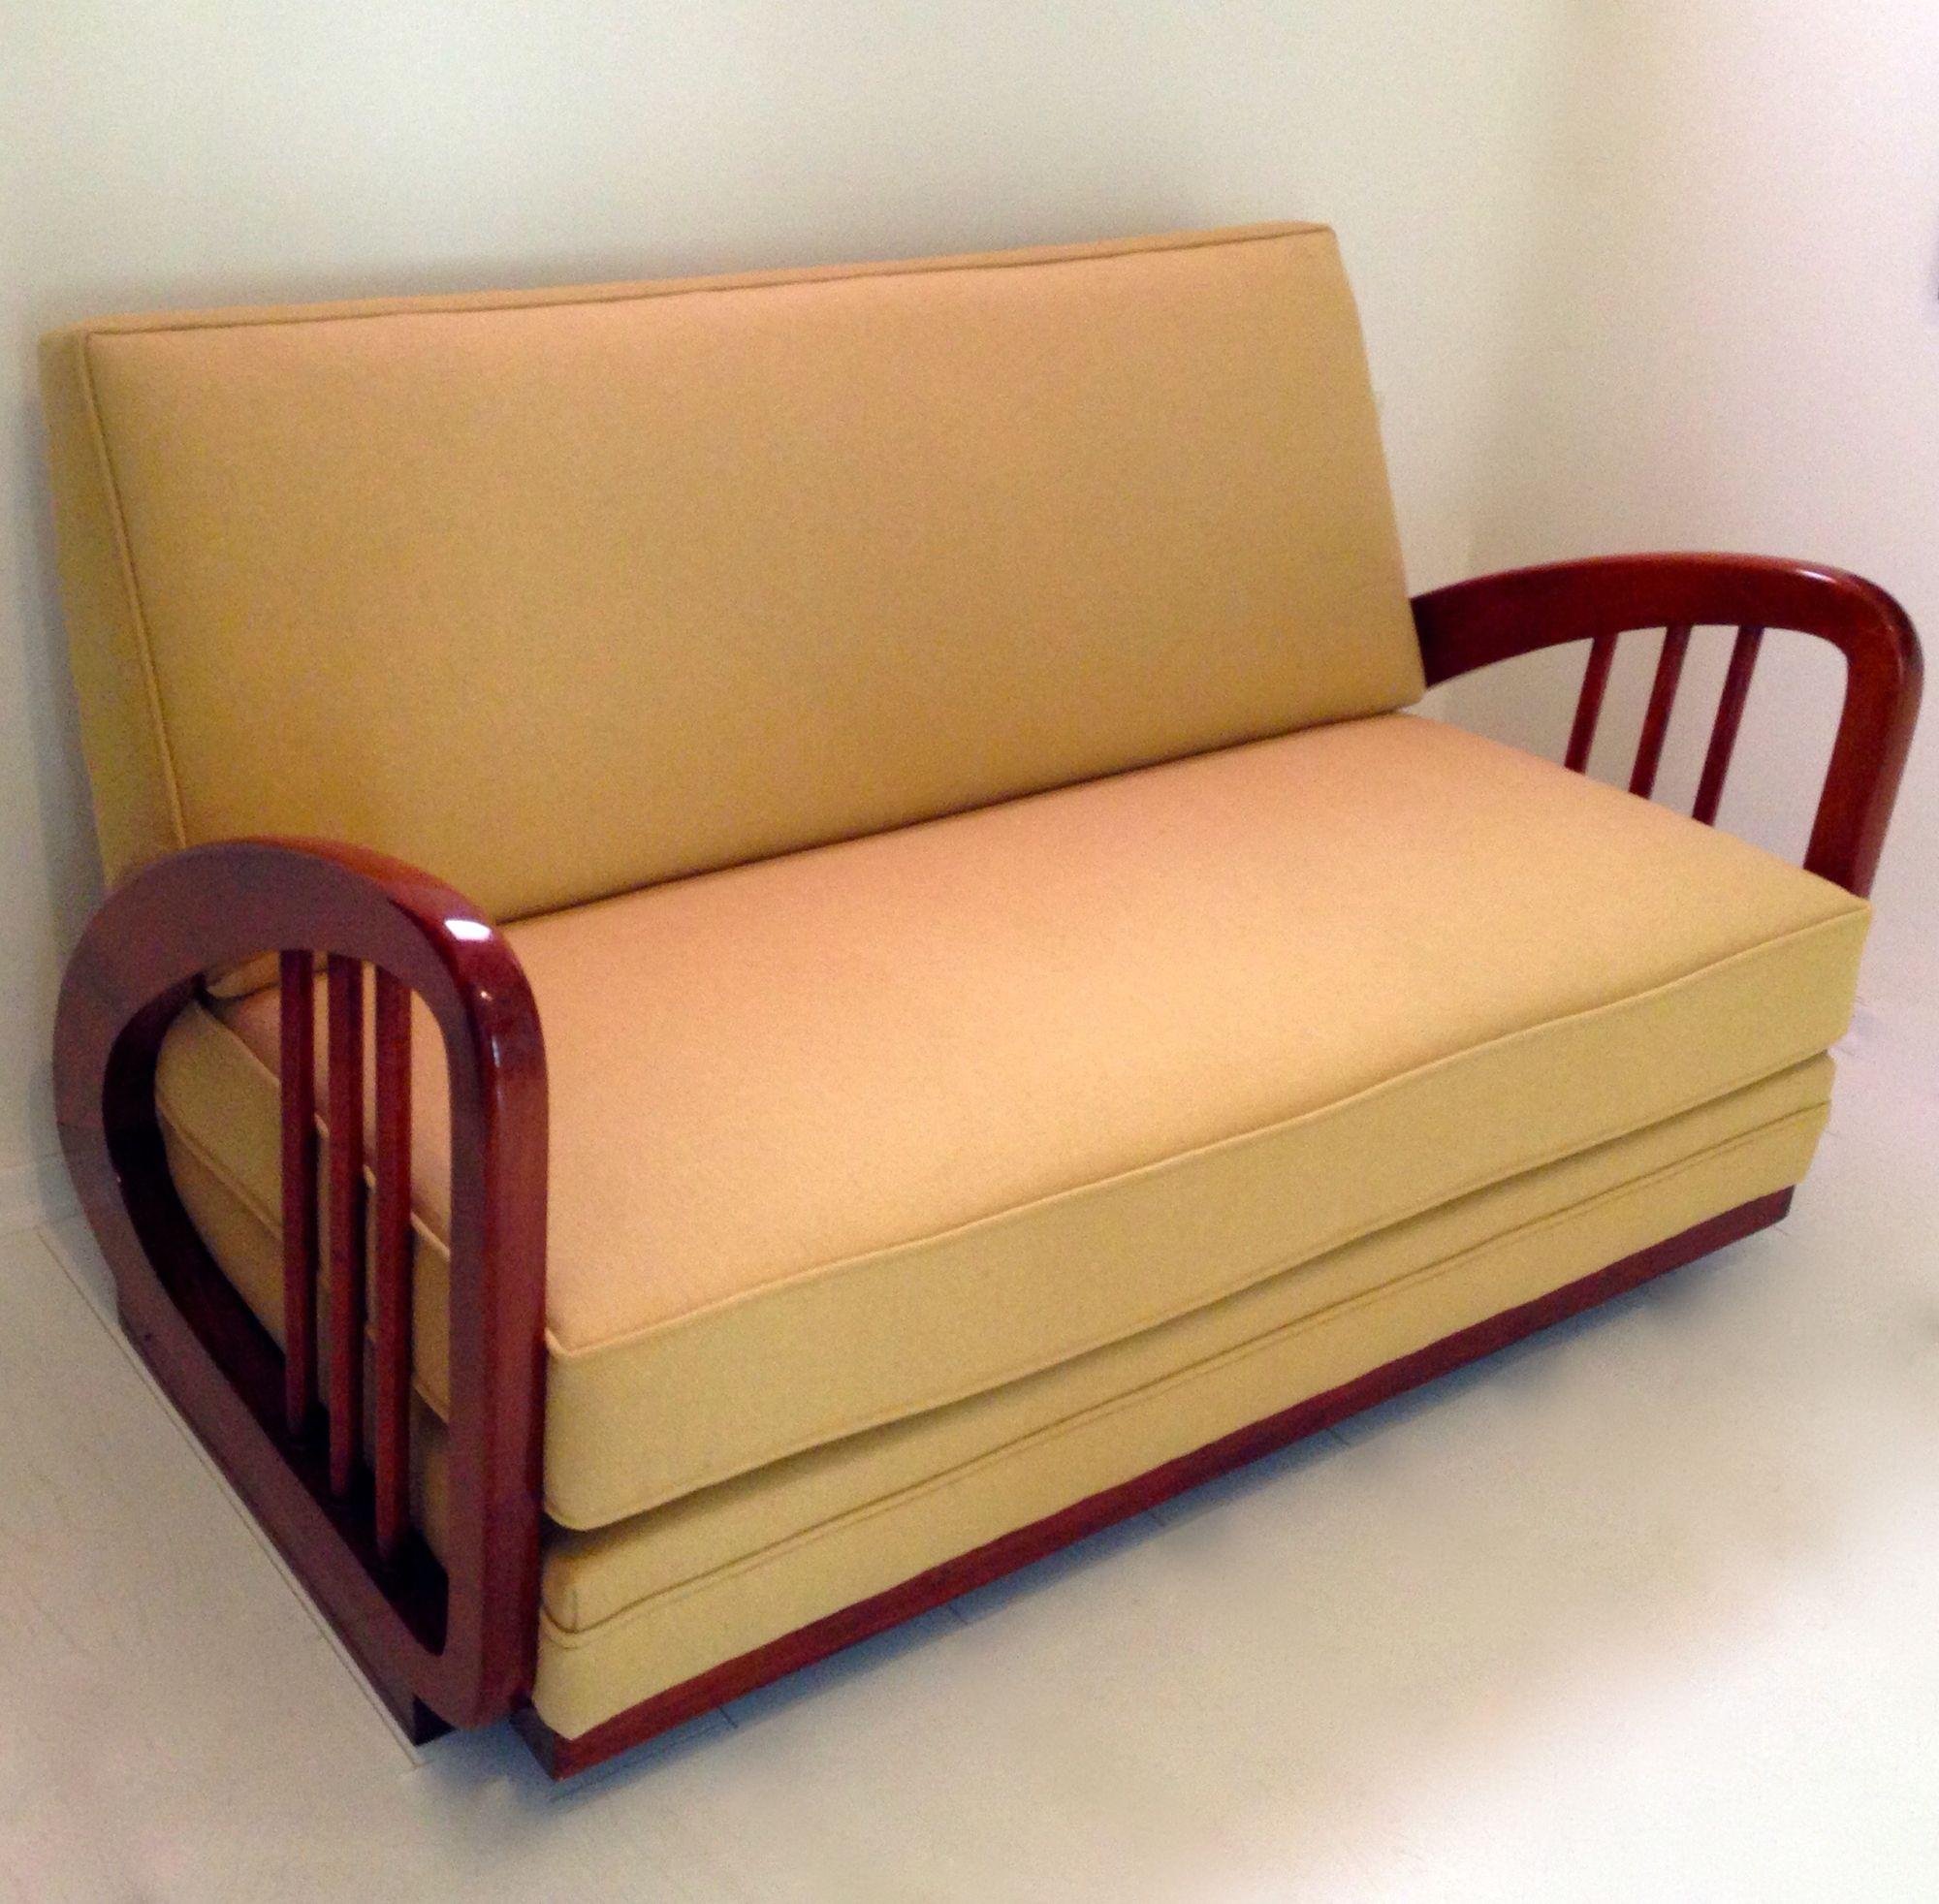 Art deco vienna sofa circa1920s wooden sofa designs